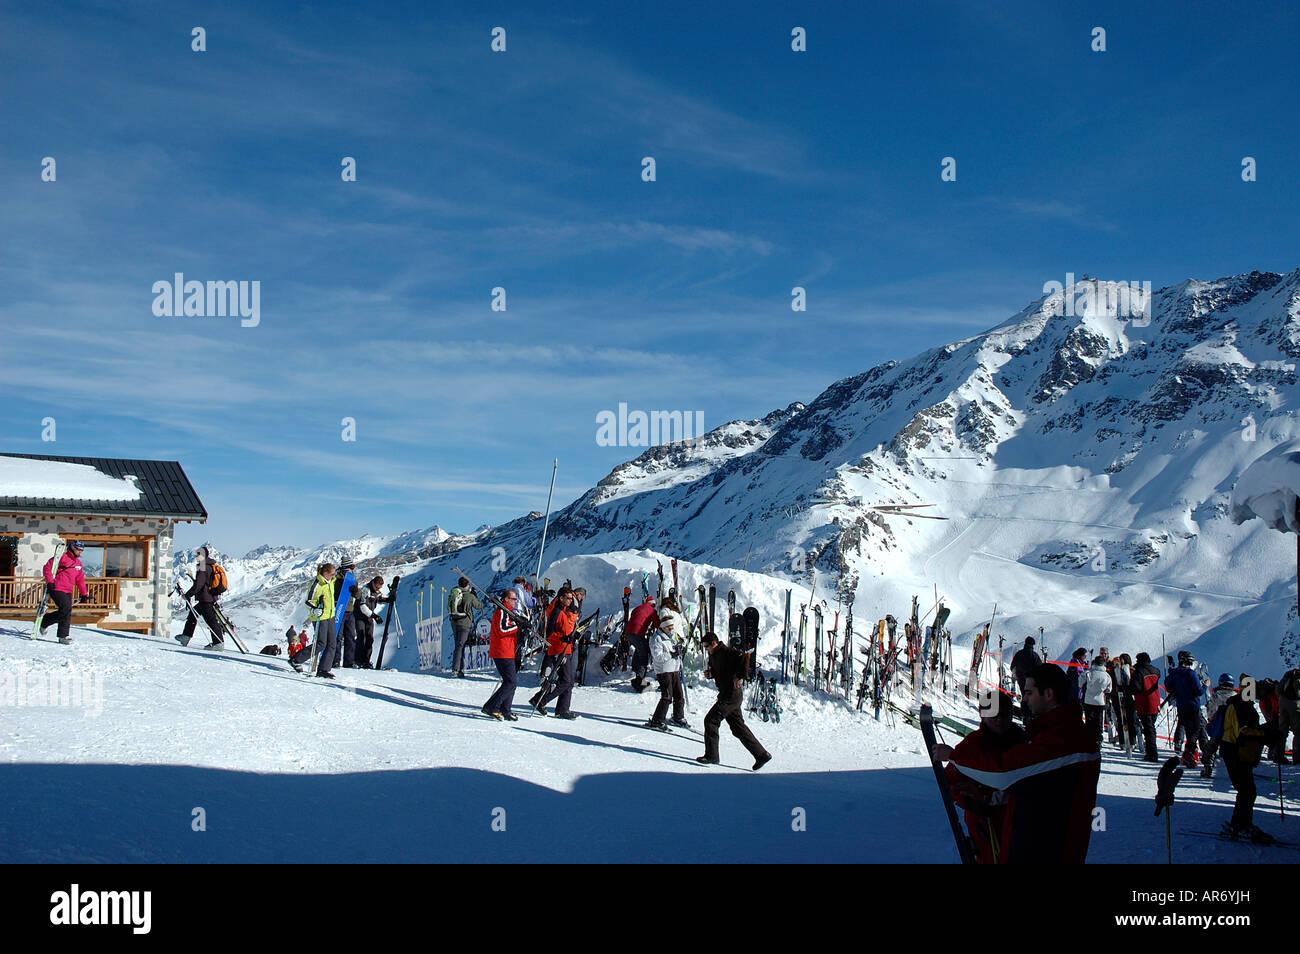 Transarc Lift top; Col de la Chal ; Les Arcs; Peisey Vallandry ;Savoie ;73 France; skiers; snowboarders; parked - Stock Image